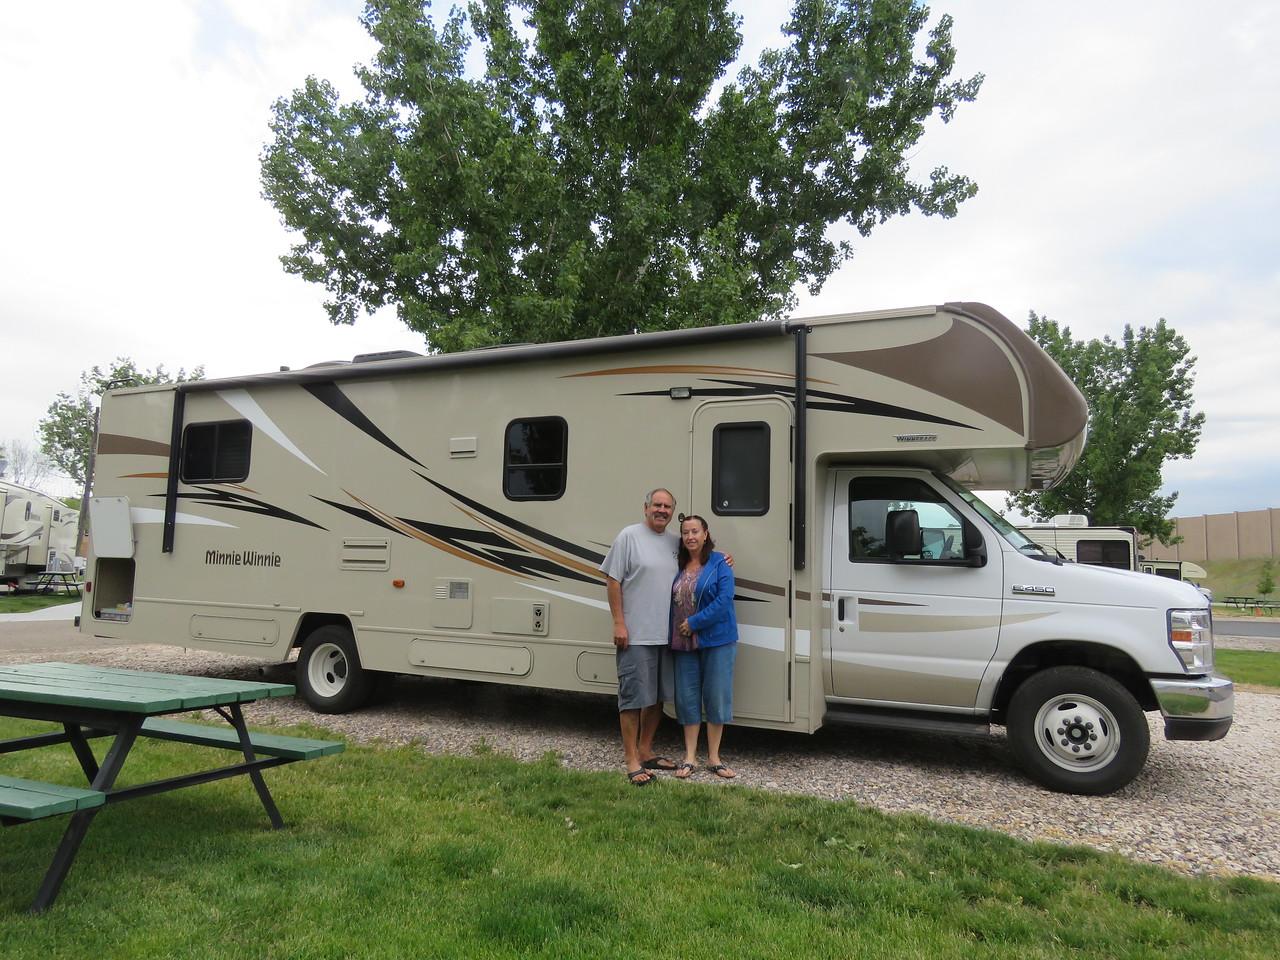 Day 18 - Century RV Park and Campground, UT